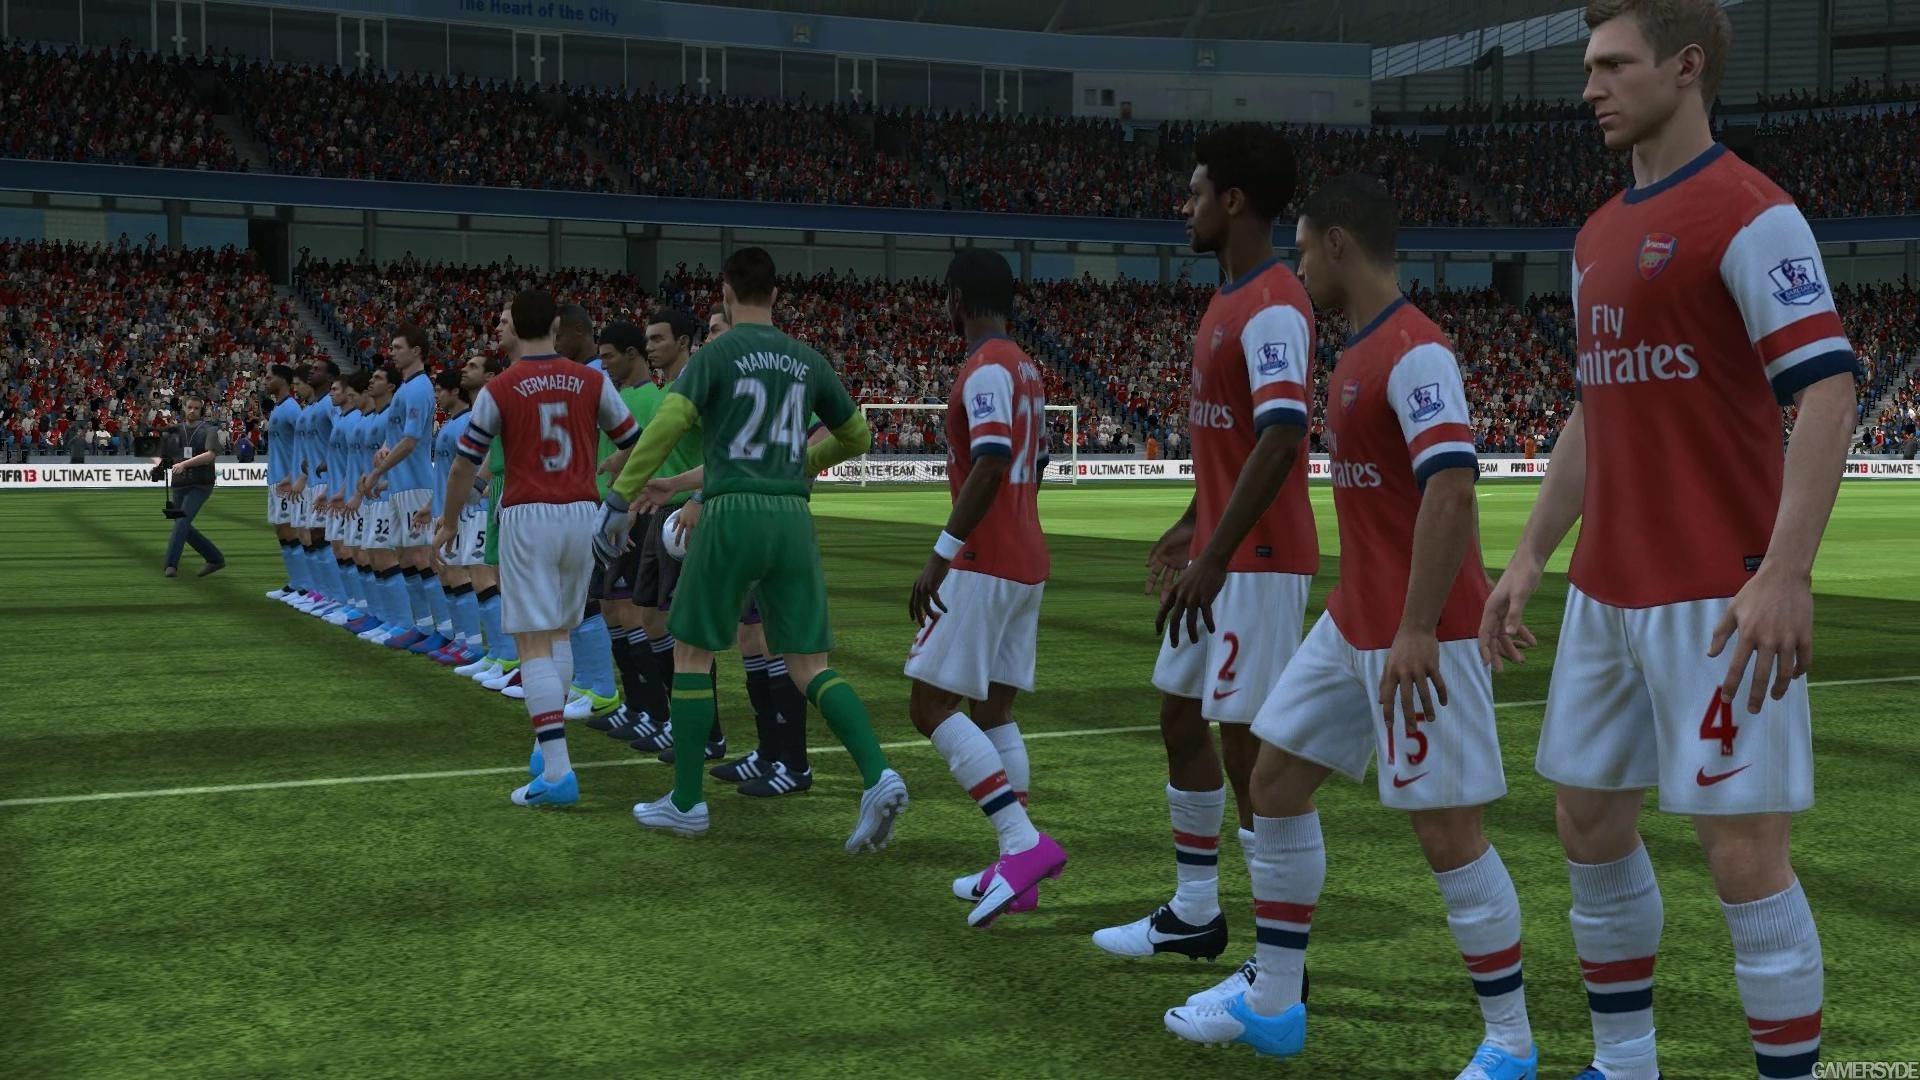 image fifa 13 20261 2509 0009 تصاویر جدید از بازی FIFA 13